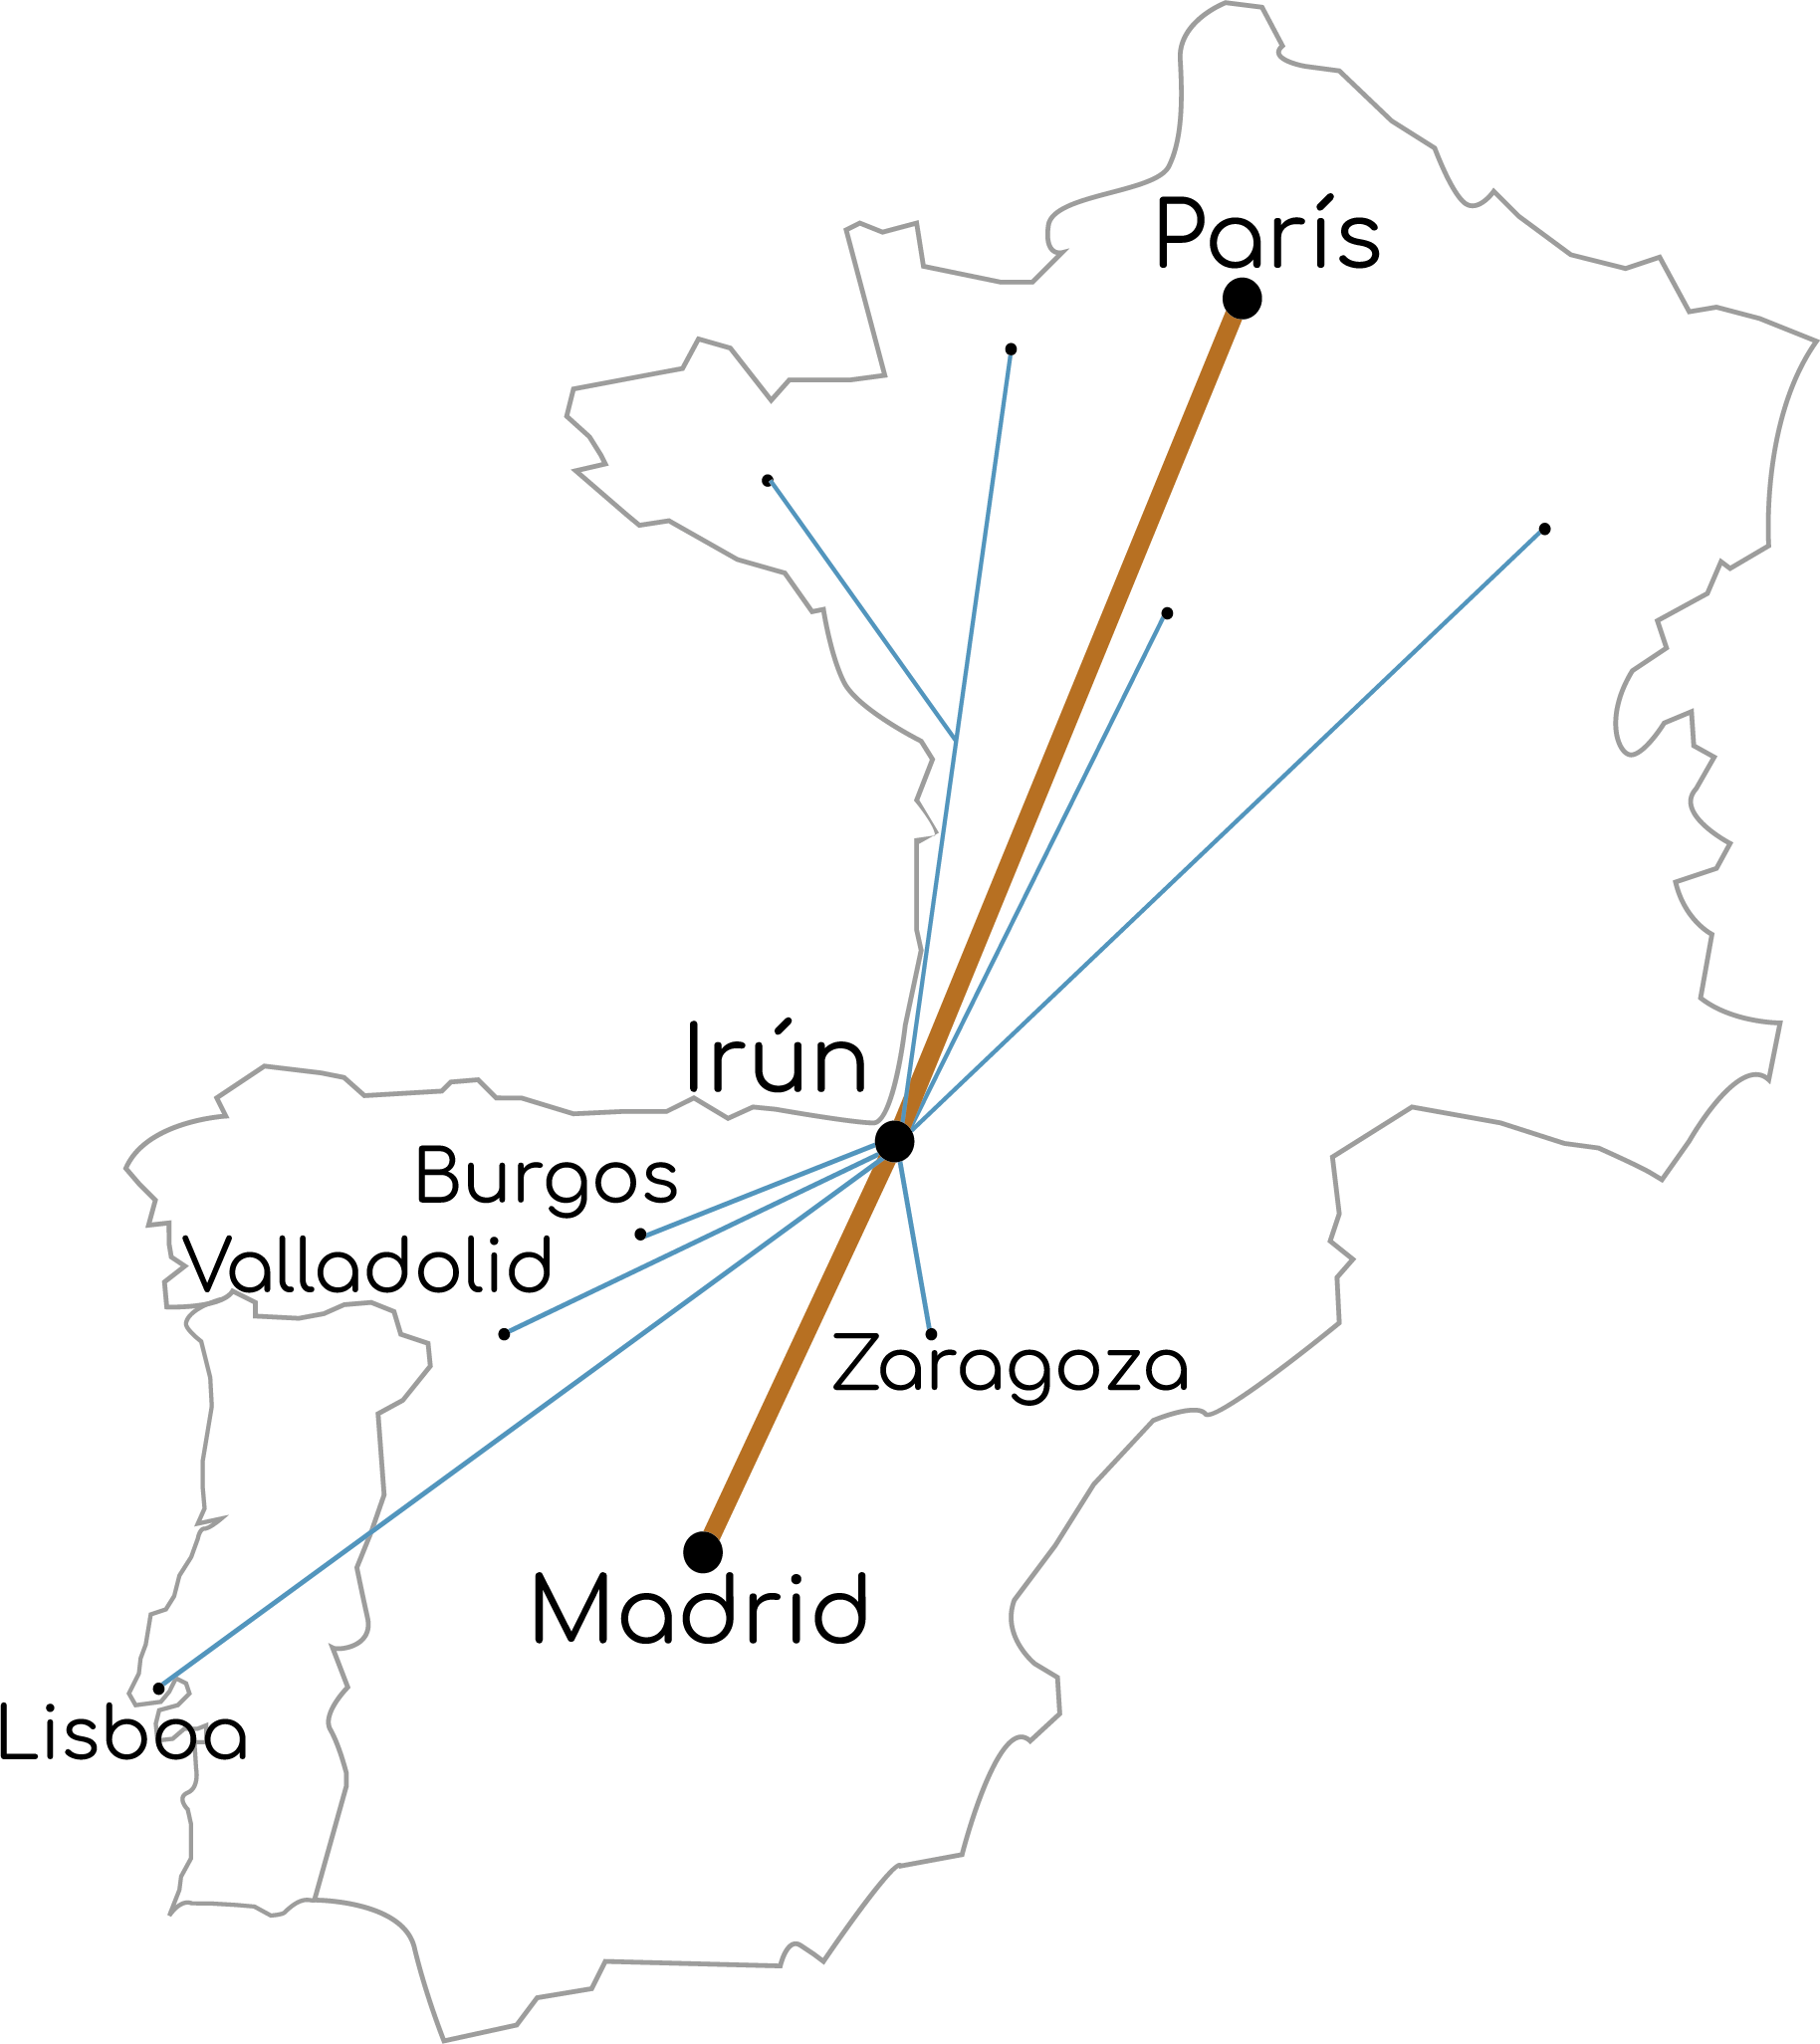 Mapa de la ruta de transporte Madrid-Irun-París